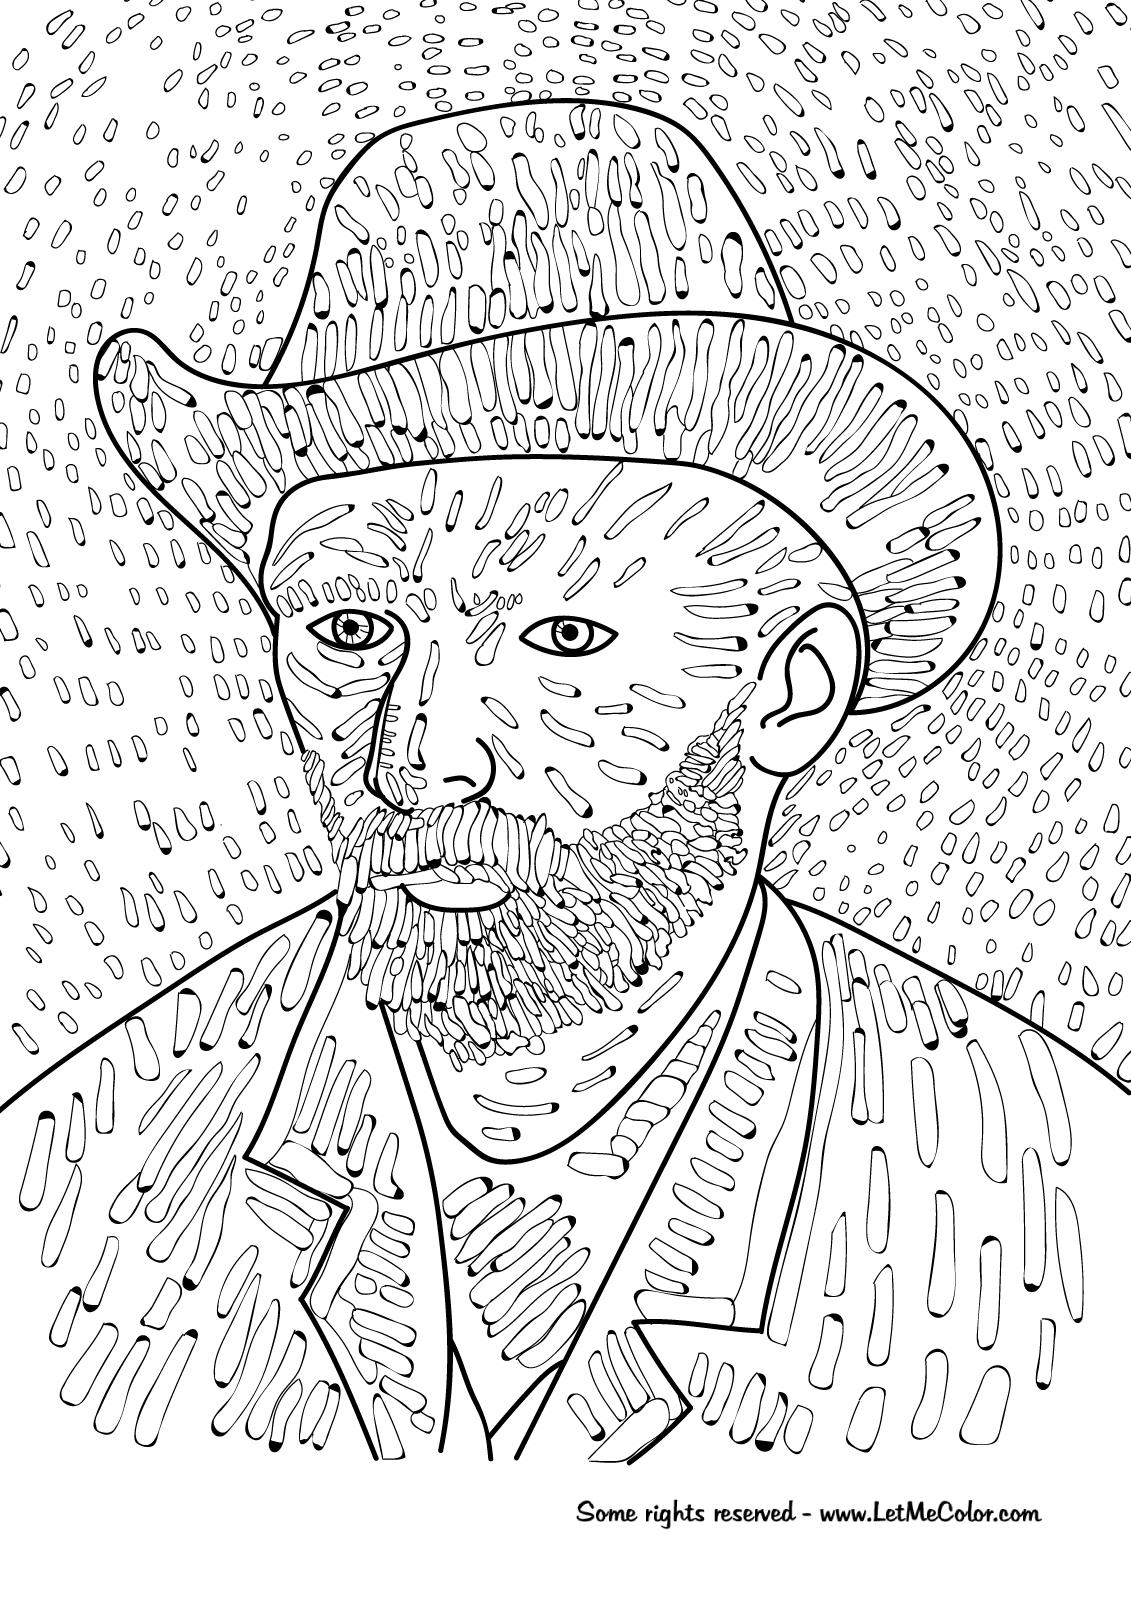 new coloring pages gogh free artes visuais desenhos